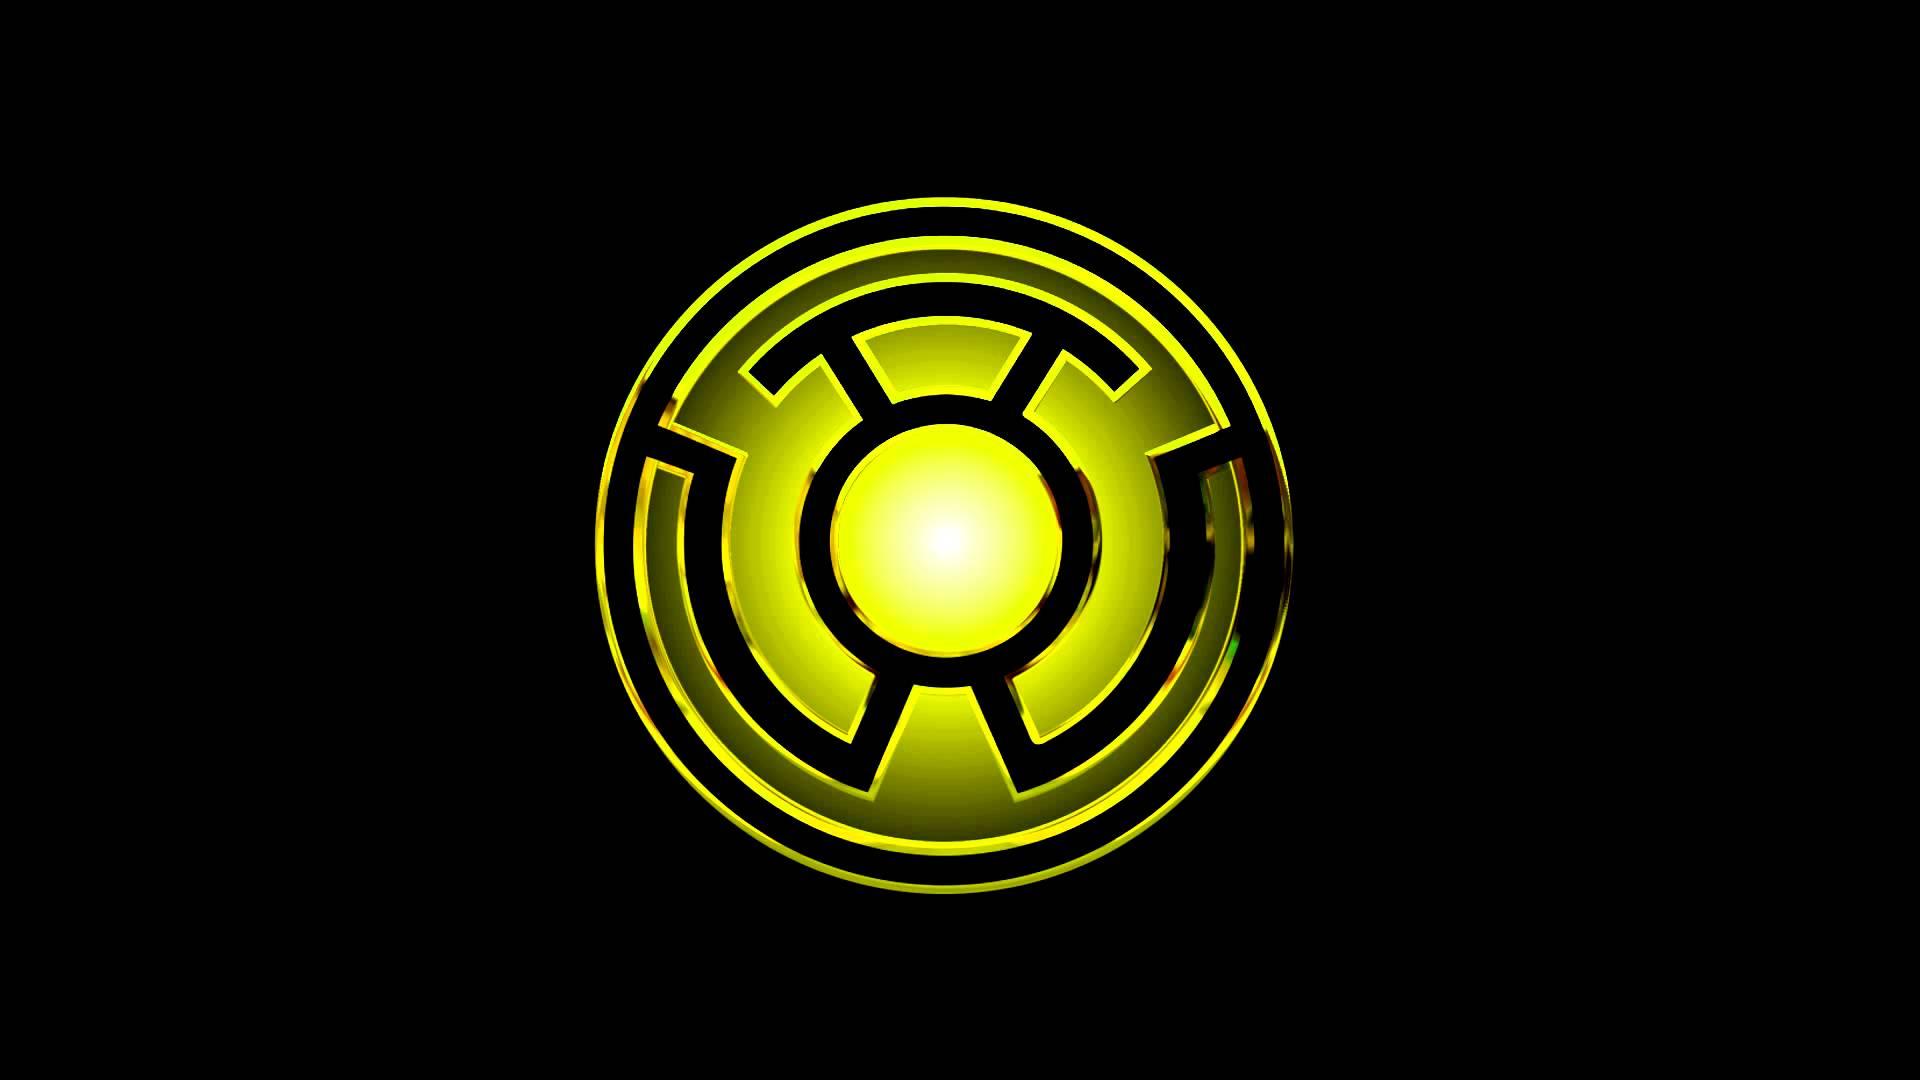 Sinestro Corps Oath - YouTube